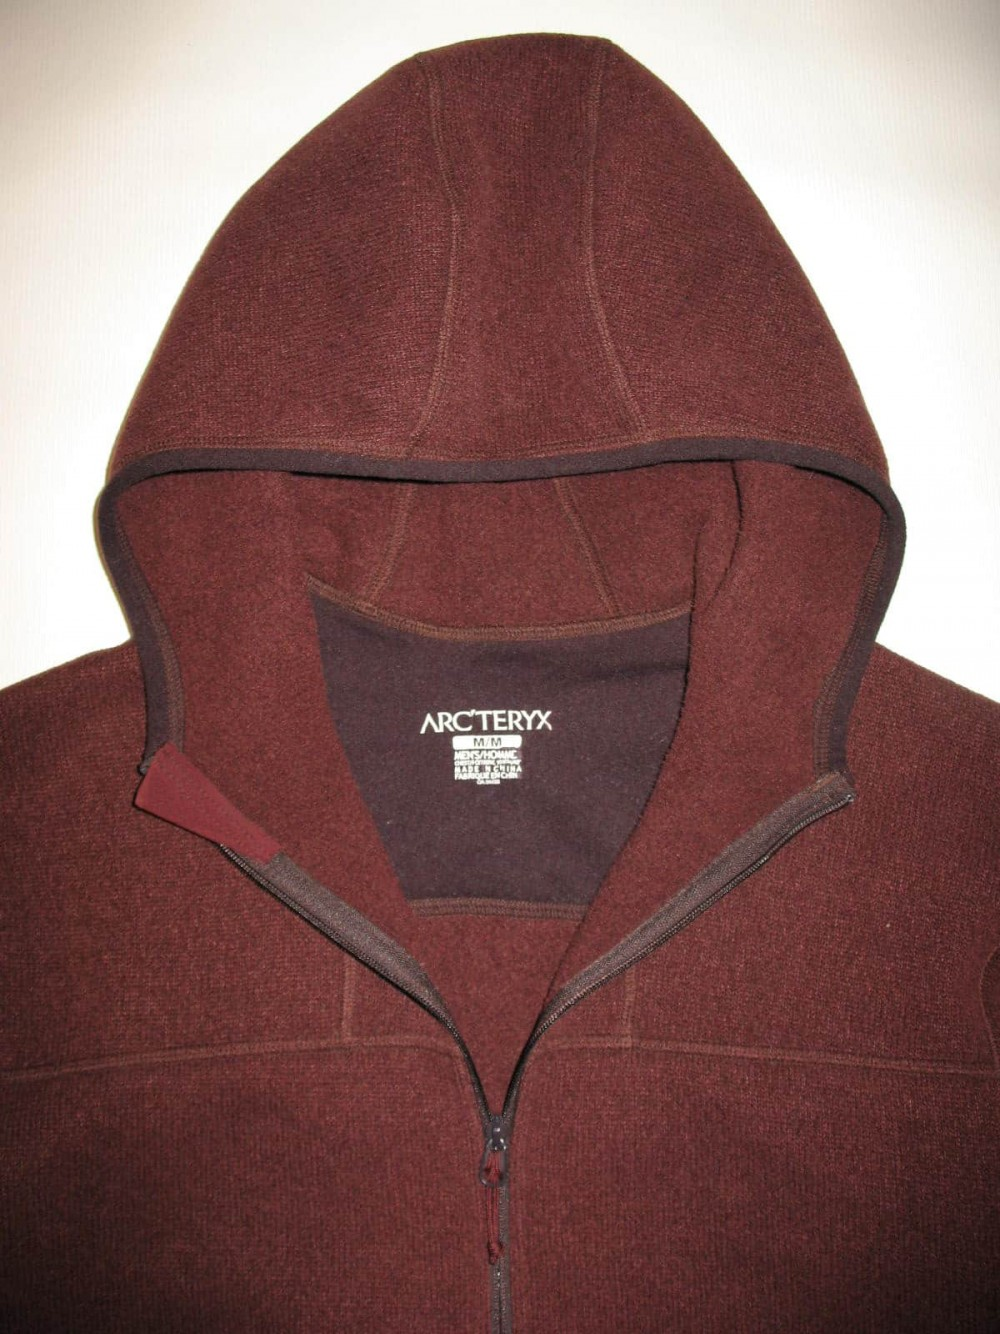 Кофта ARC'TERYX covert hoody (размер M) - 3